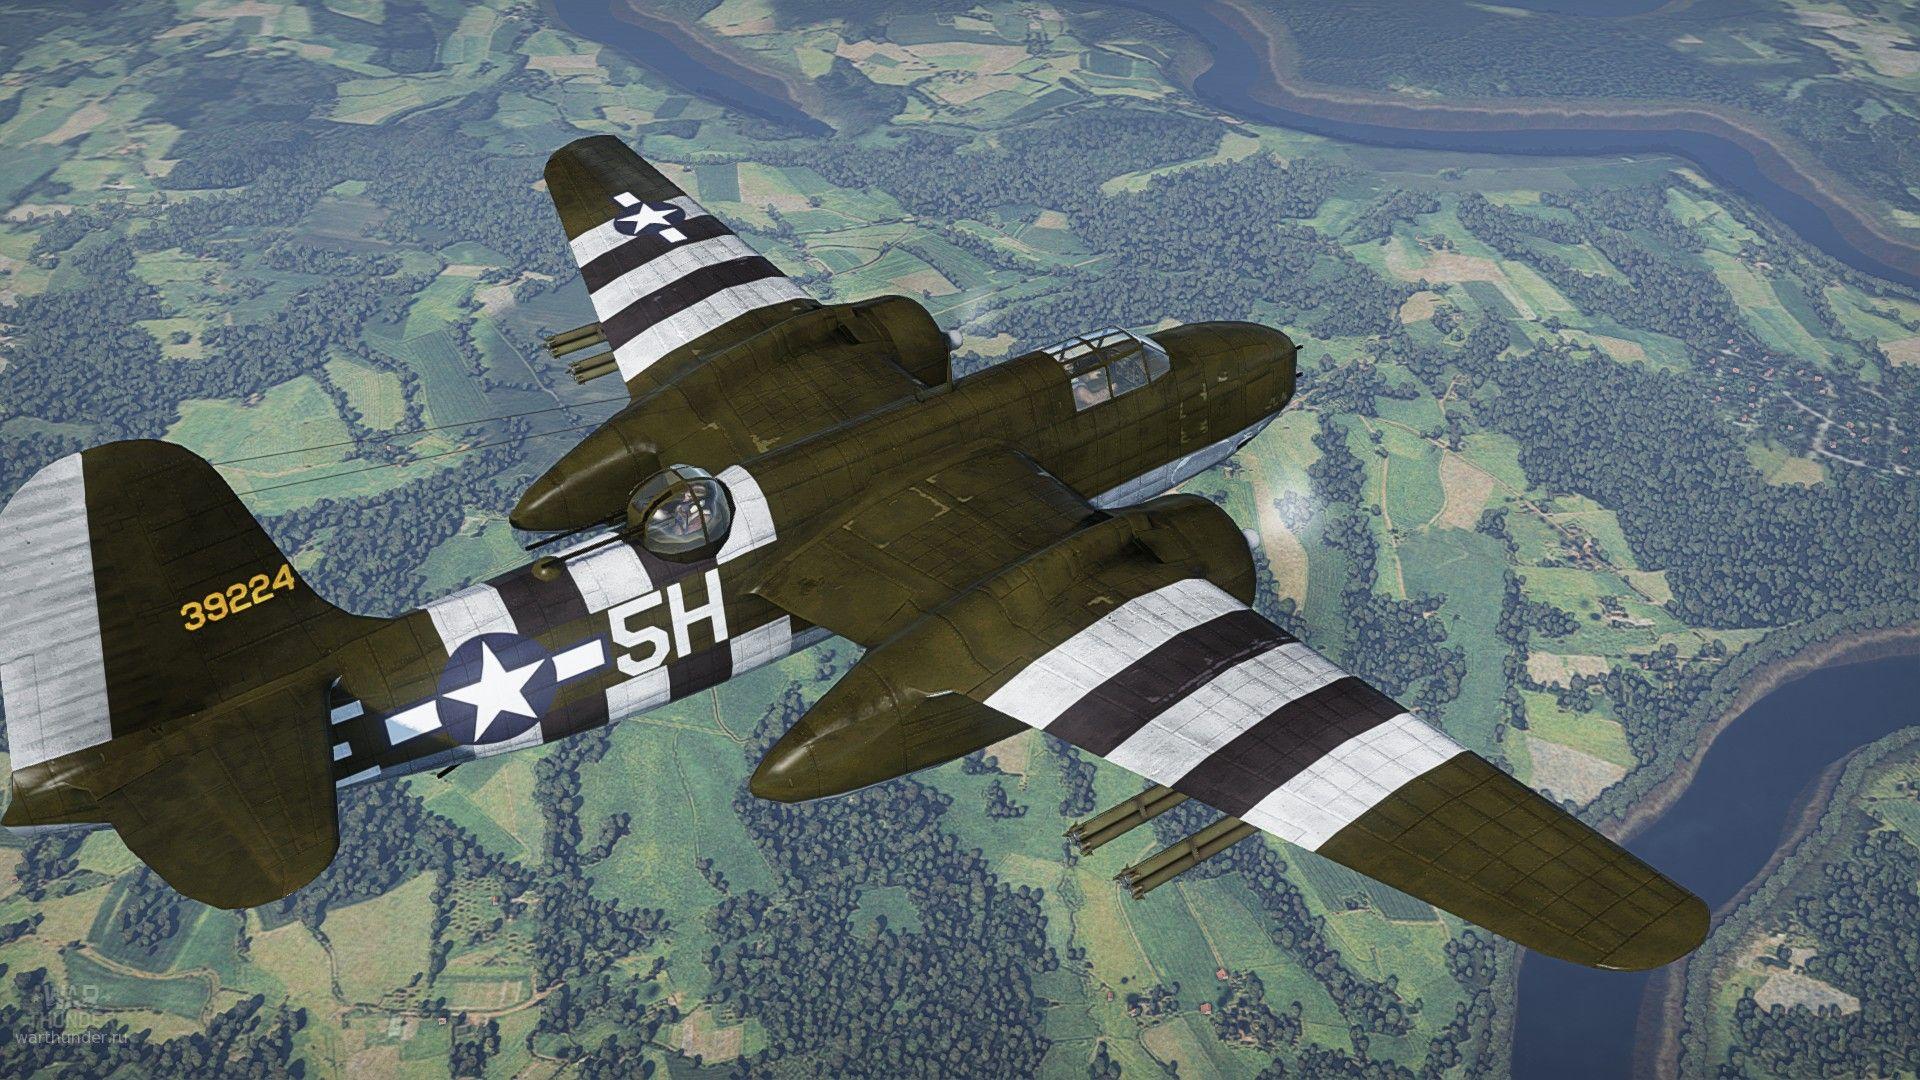 23at4mi 1920Ã 1080 airplanes pinterest airplanes